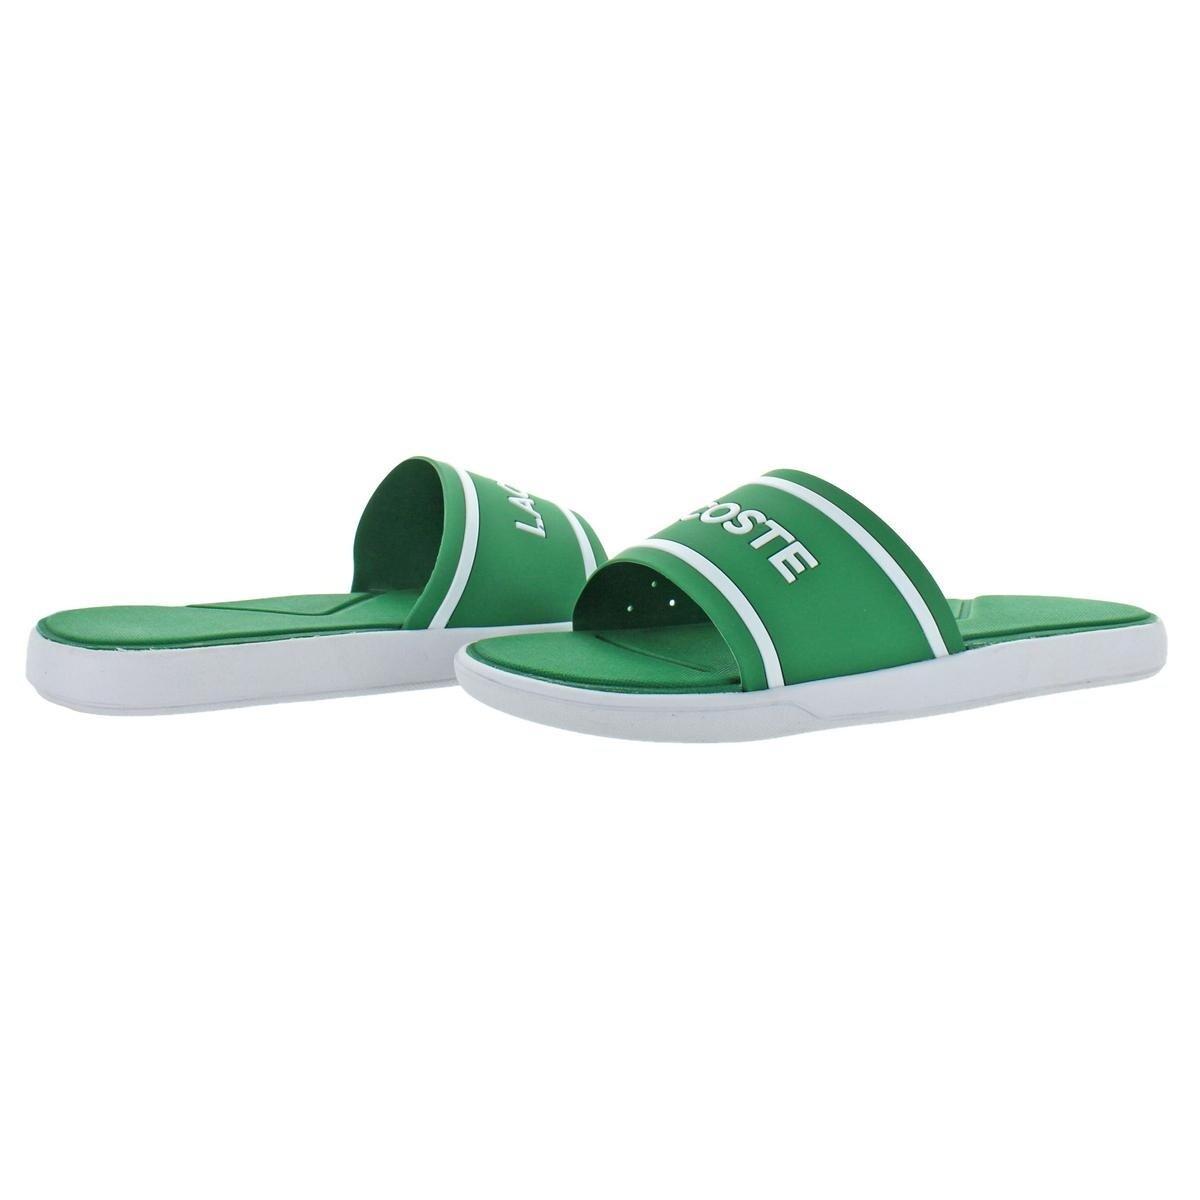 f997b14b94bf Shop Lacoste Mens L.30 Slide 118 3 Slide Sandals Casual Athletic ...